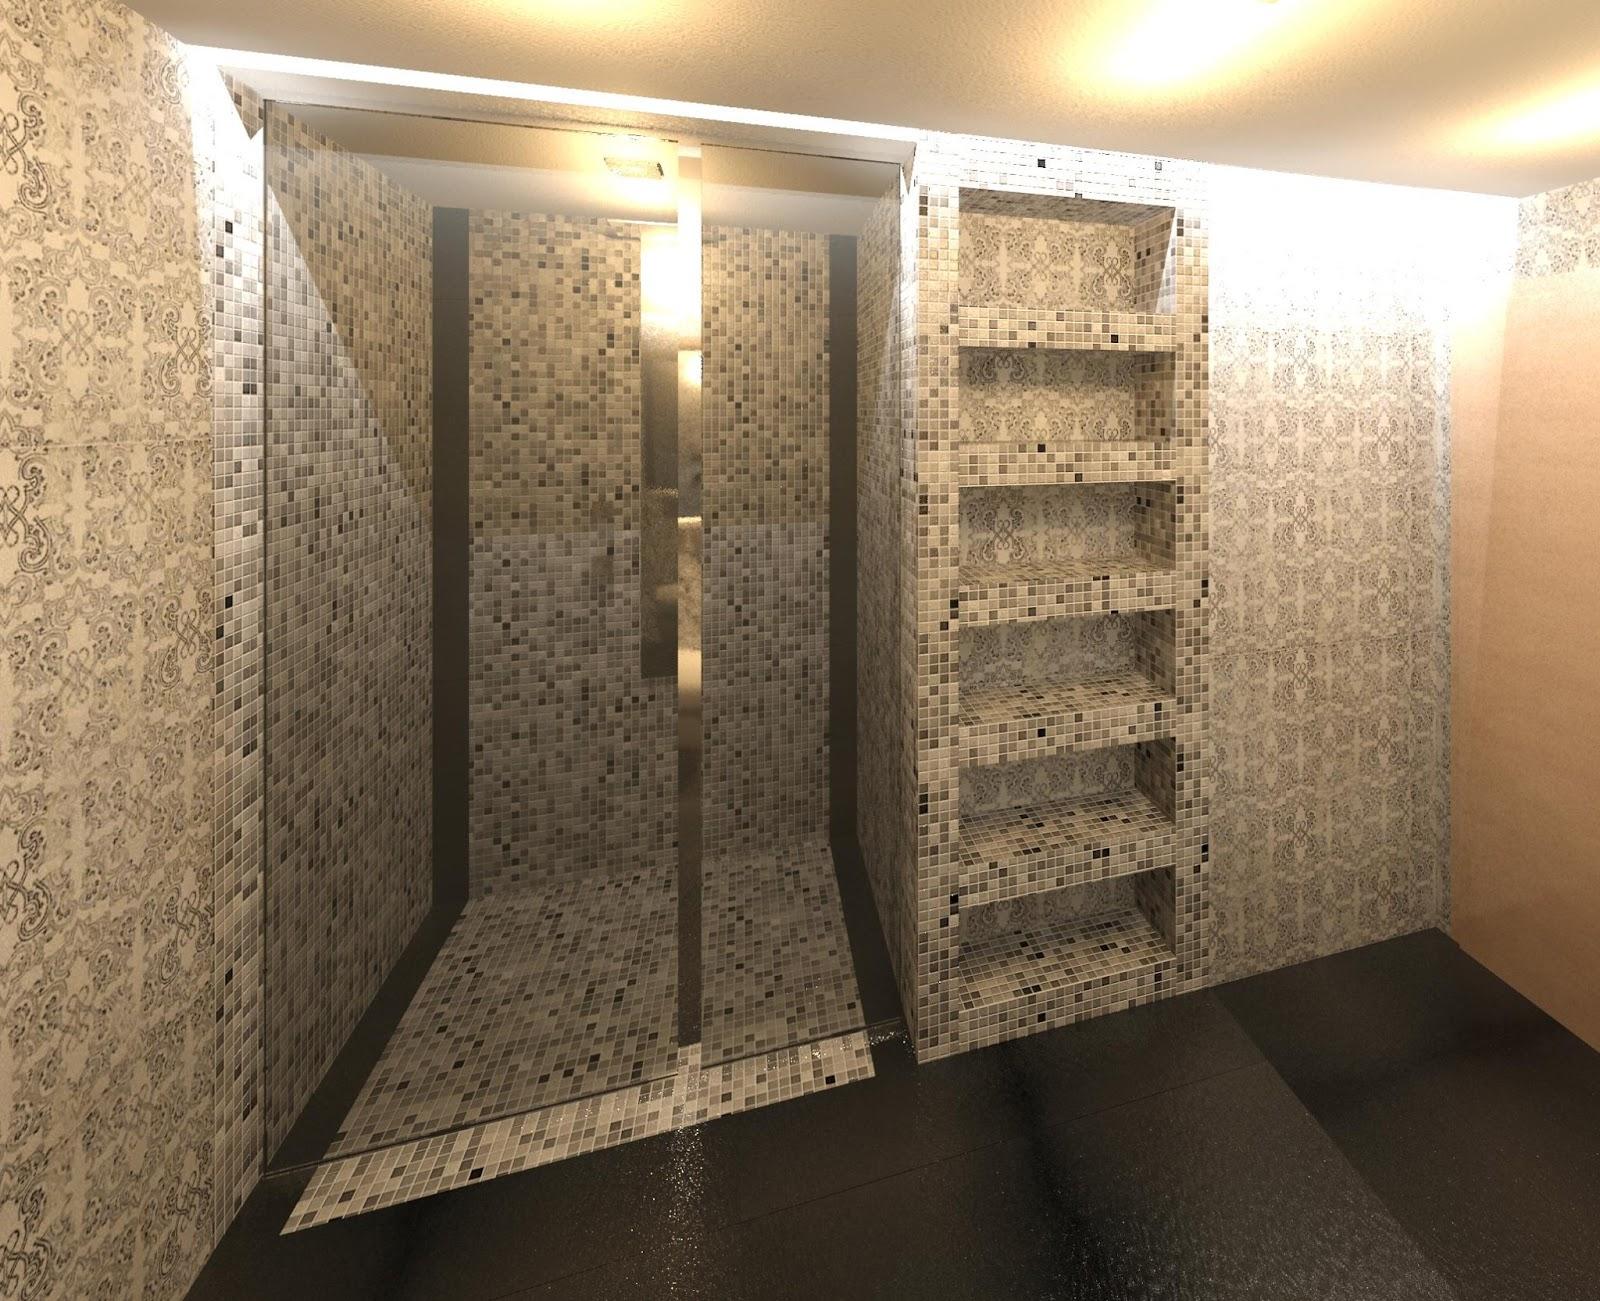 Bagni moderni mosaico ~ avienix.com for .